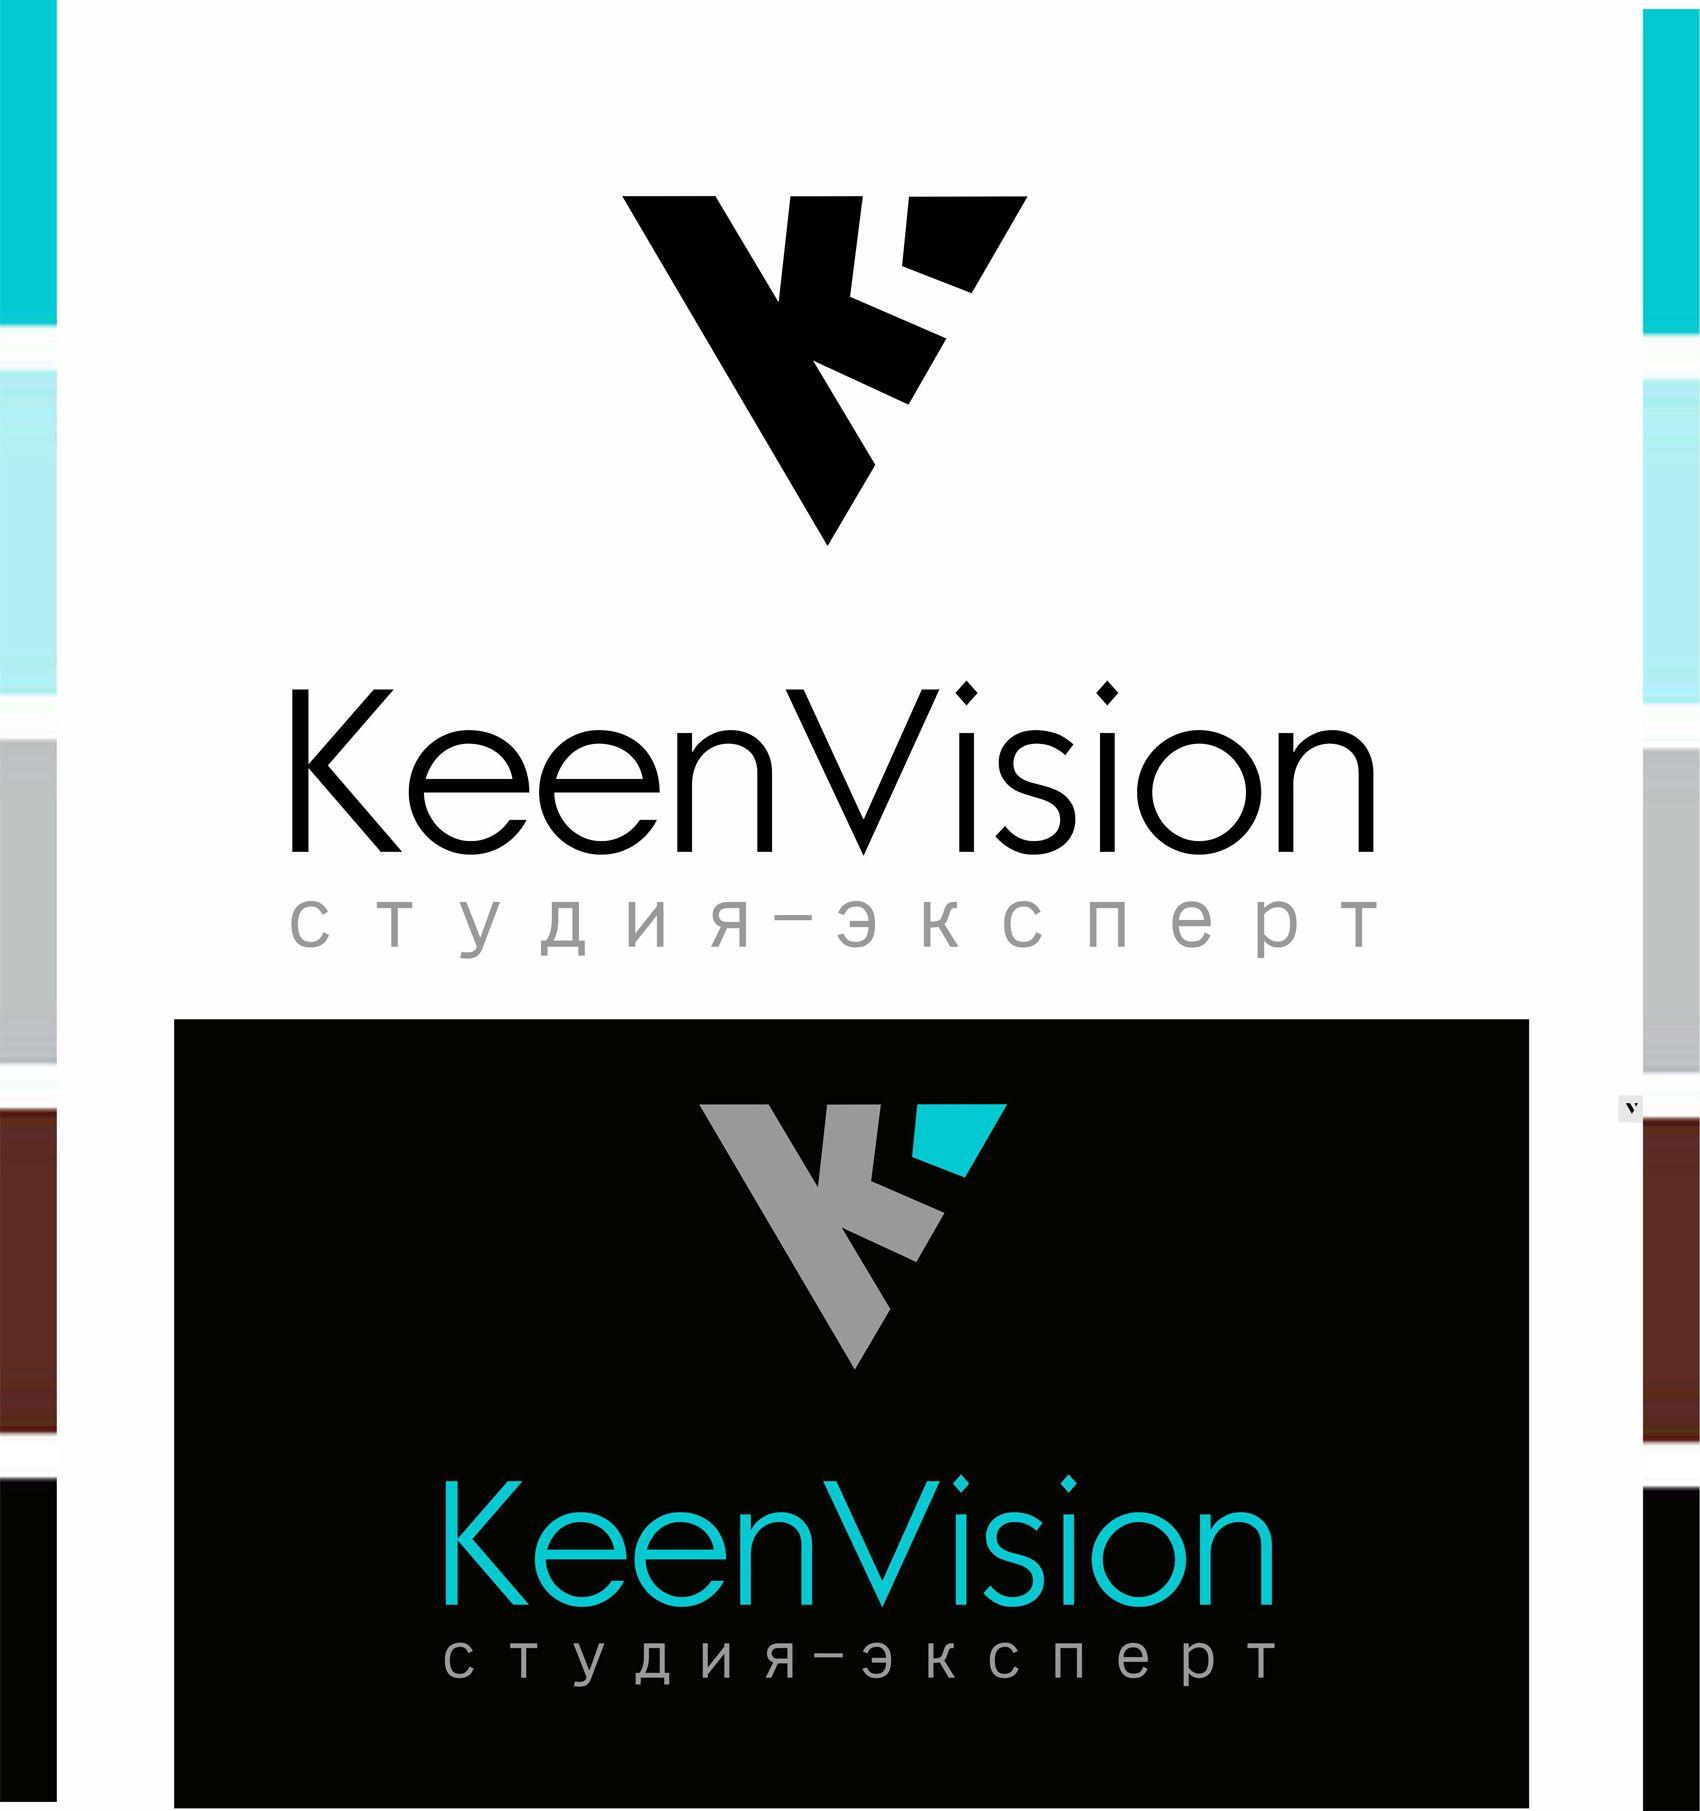 Логотип для KeenVision - дизайнер yulyok13